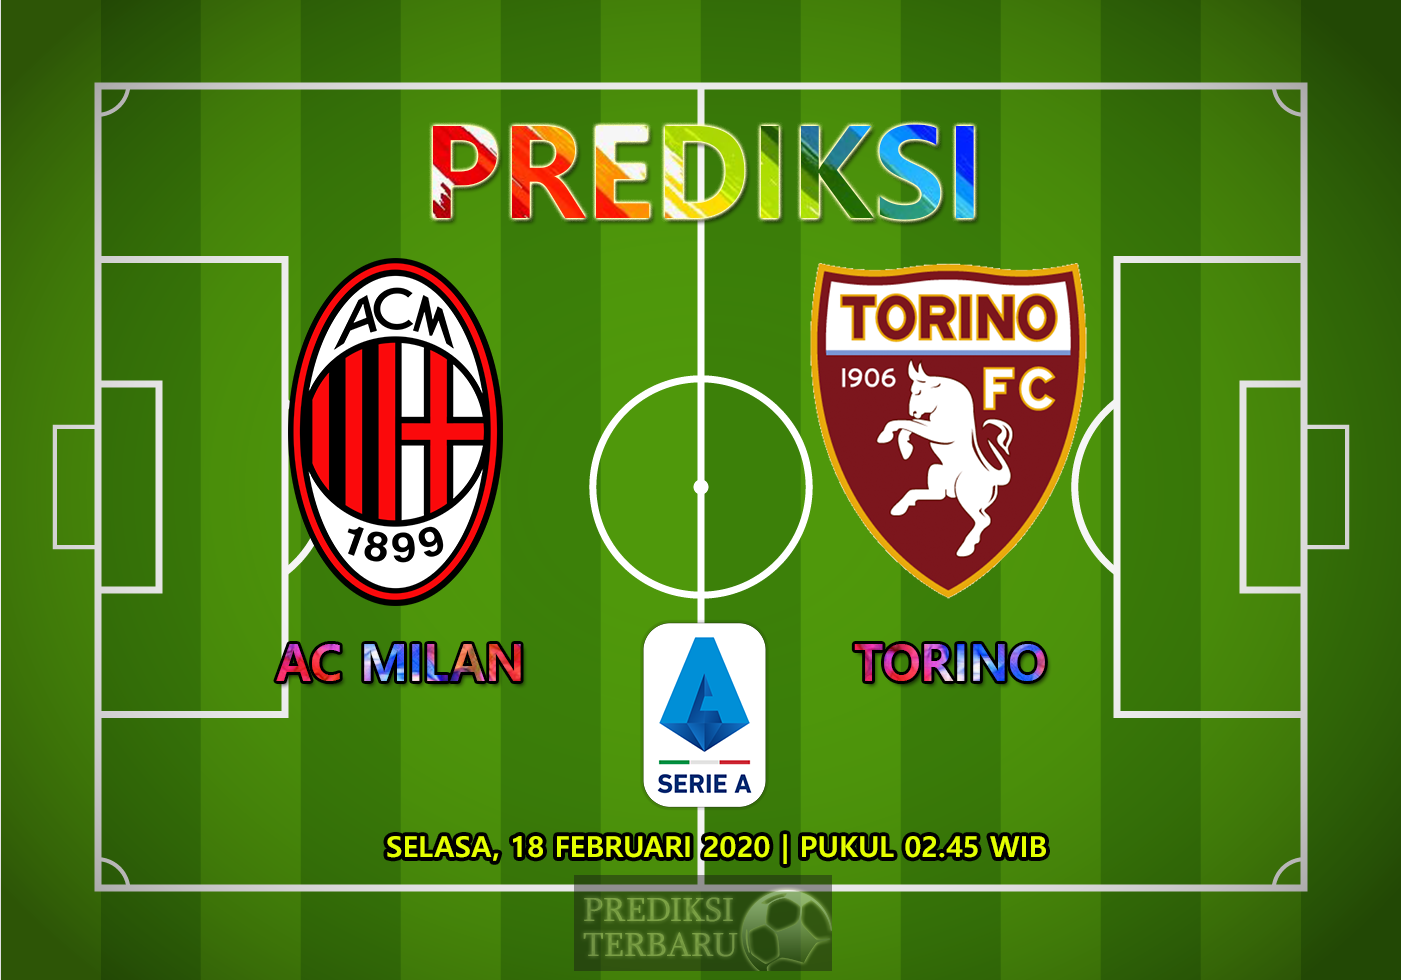 Prediksi Milan Vs Torino, Selasa 18 Februari